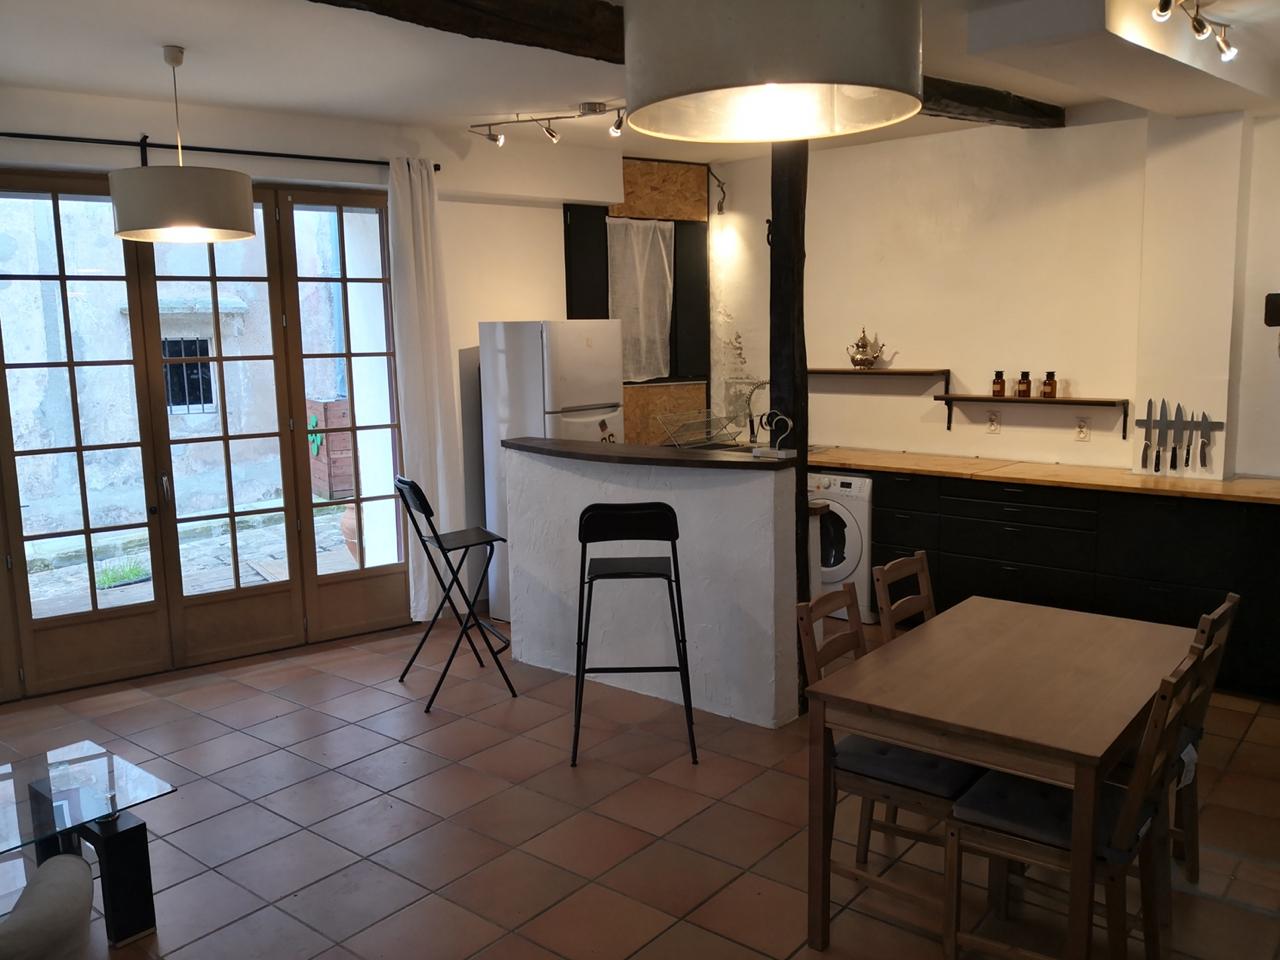 vente appartement à CIBOURE - 330 000